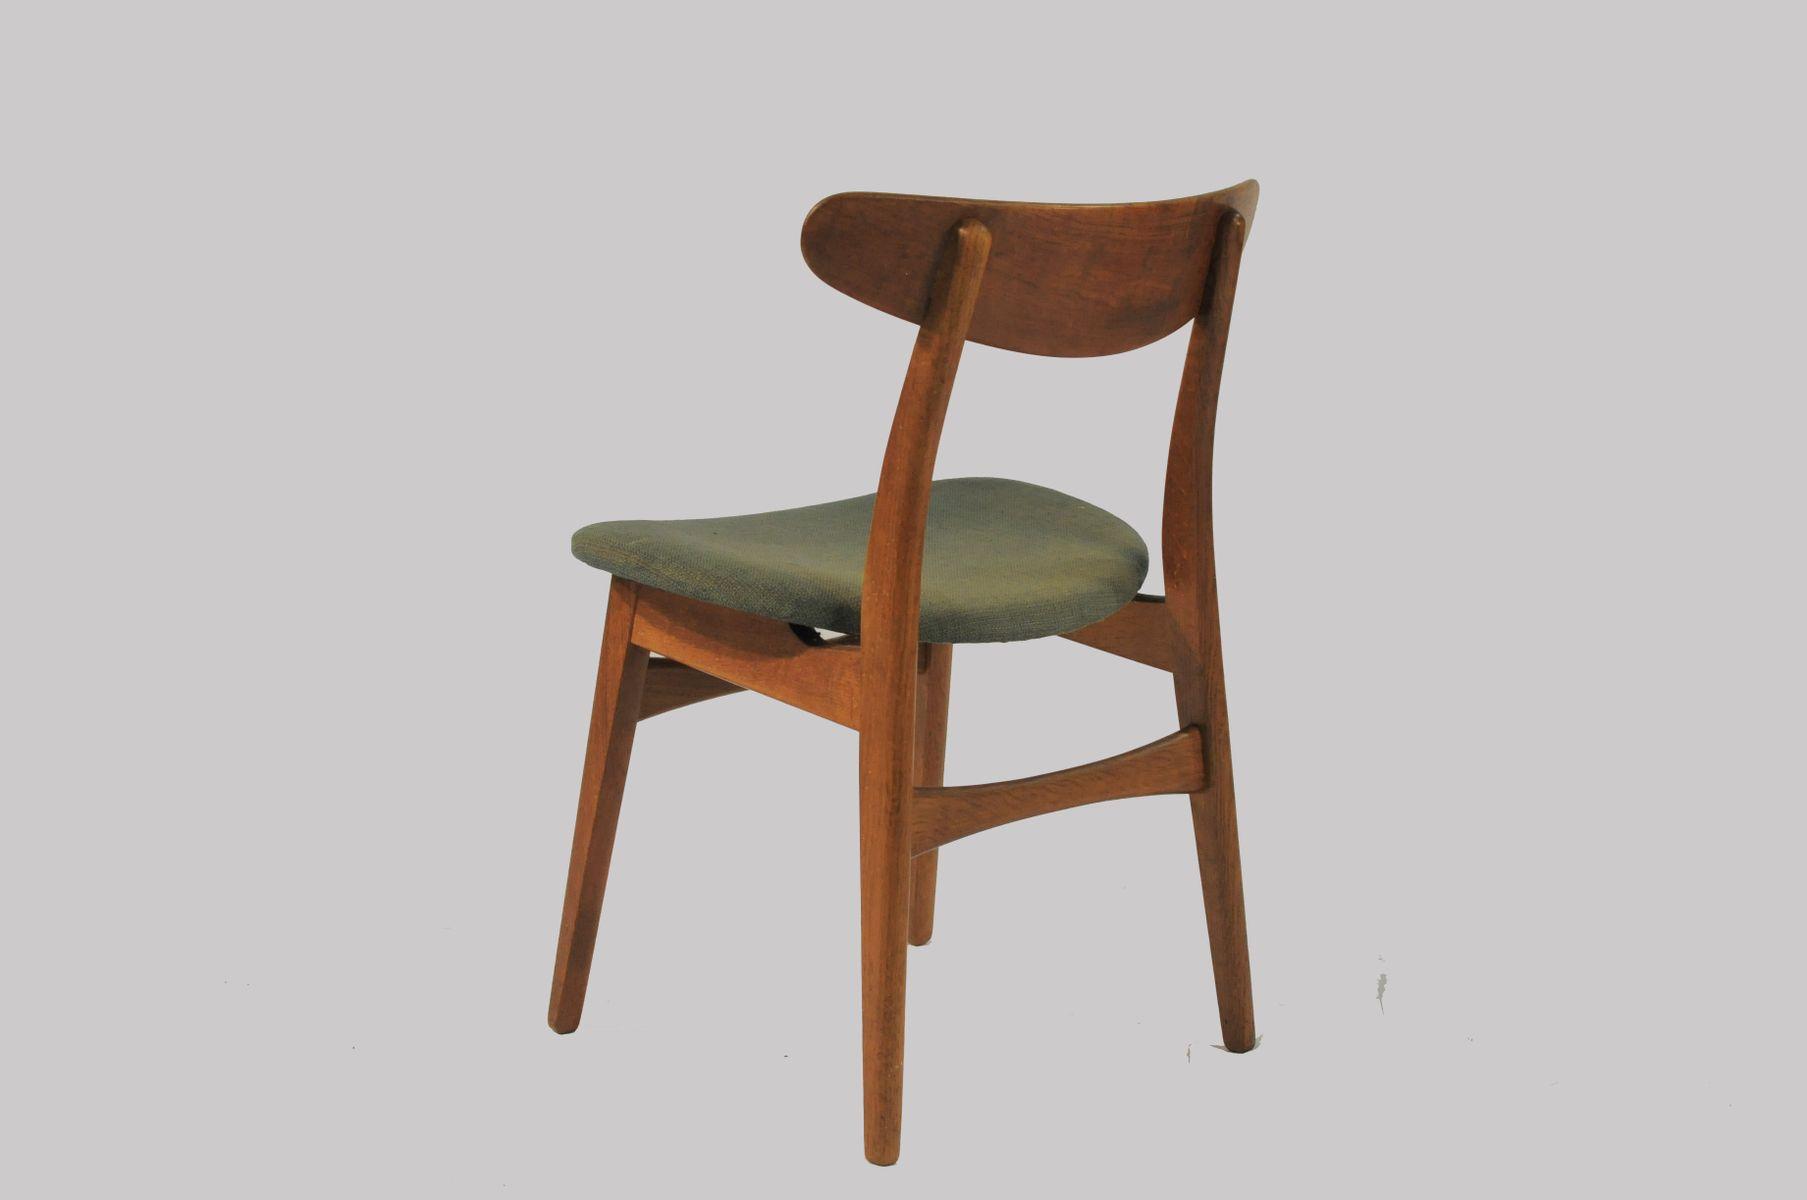 CH30 Oak Dining Chairs by Hans J Wegner for Carl Hansen & S¸n